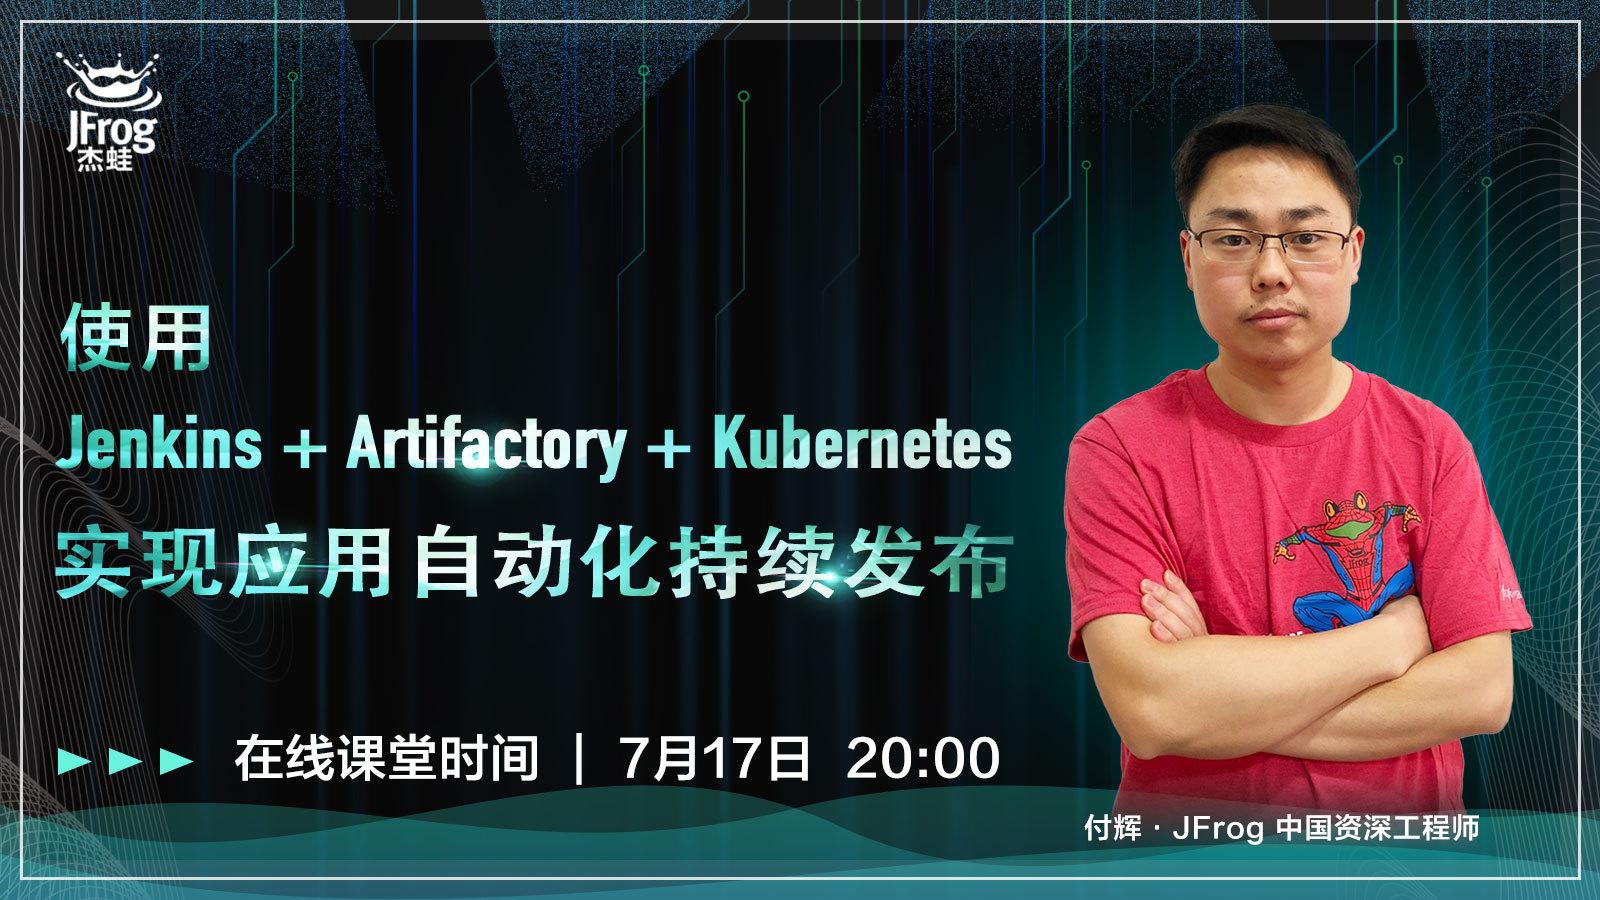 使用 Jenkins + Artifactory + Kubernetes 实现应用自动化持续发布